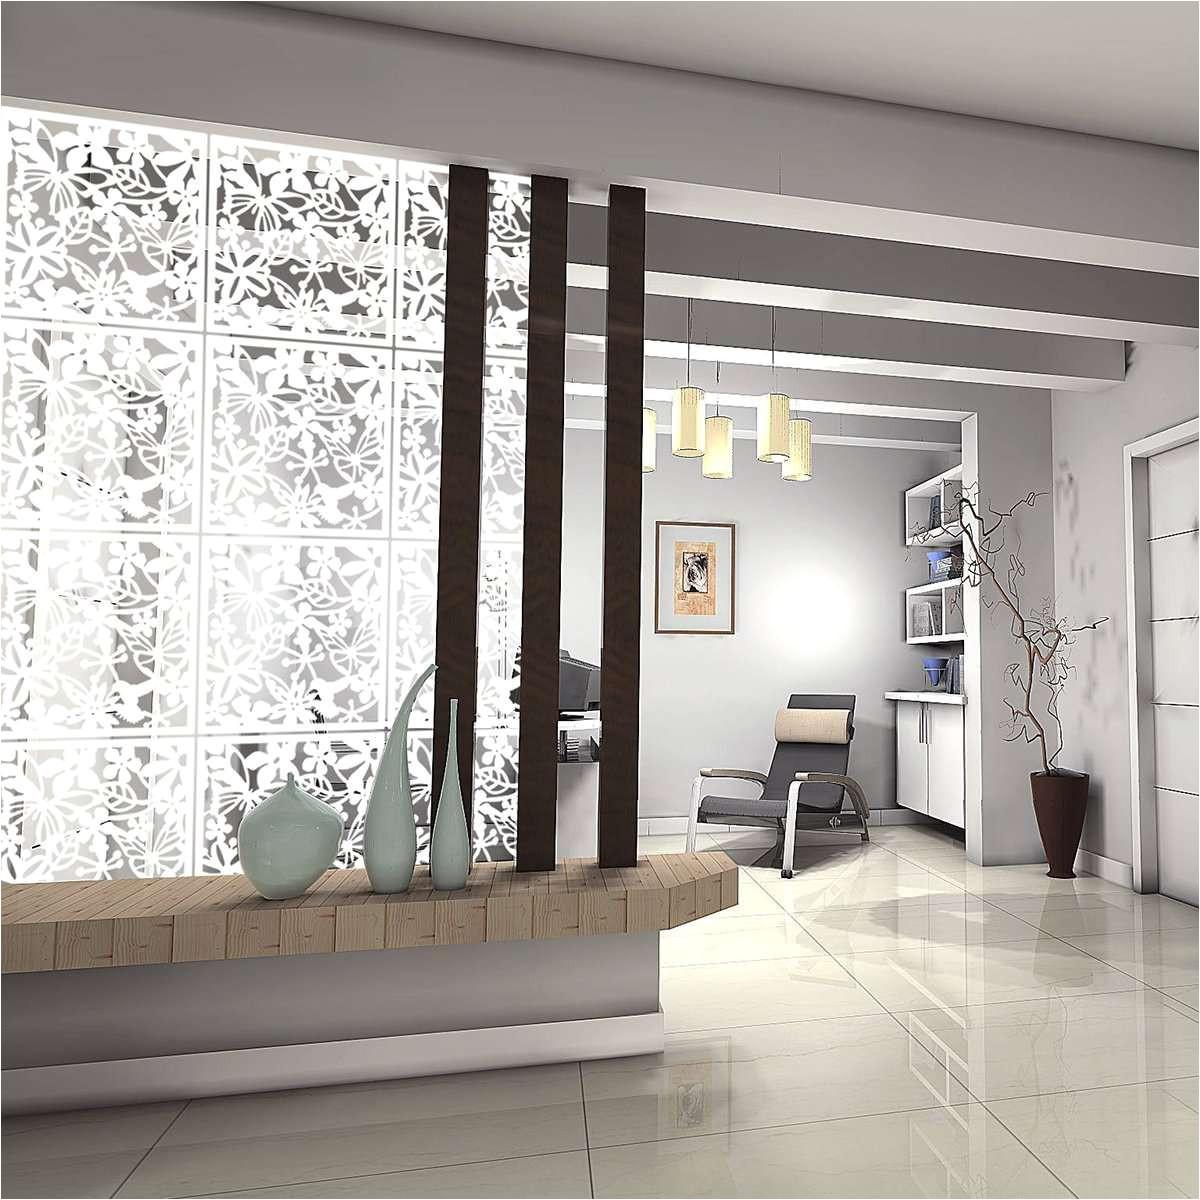 kernov room divider